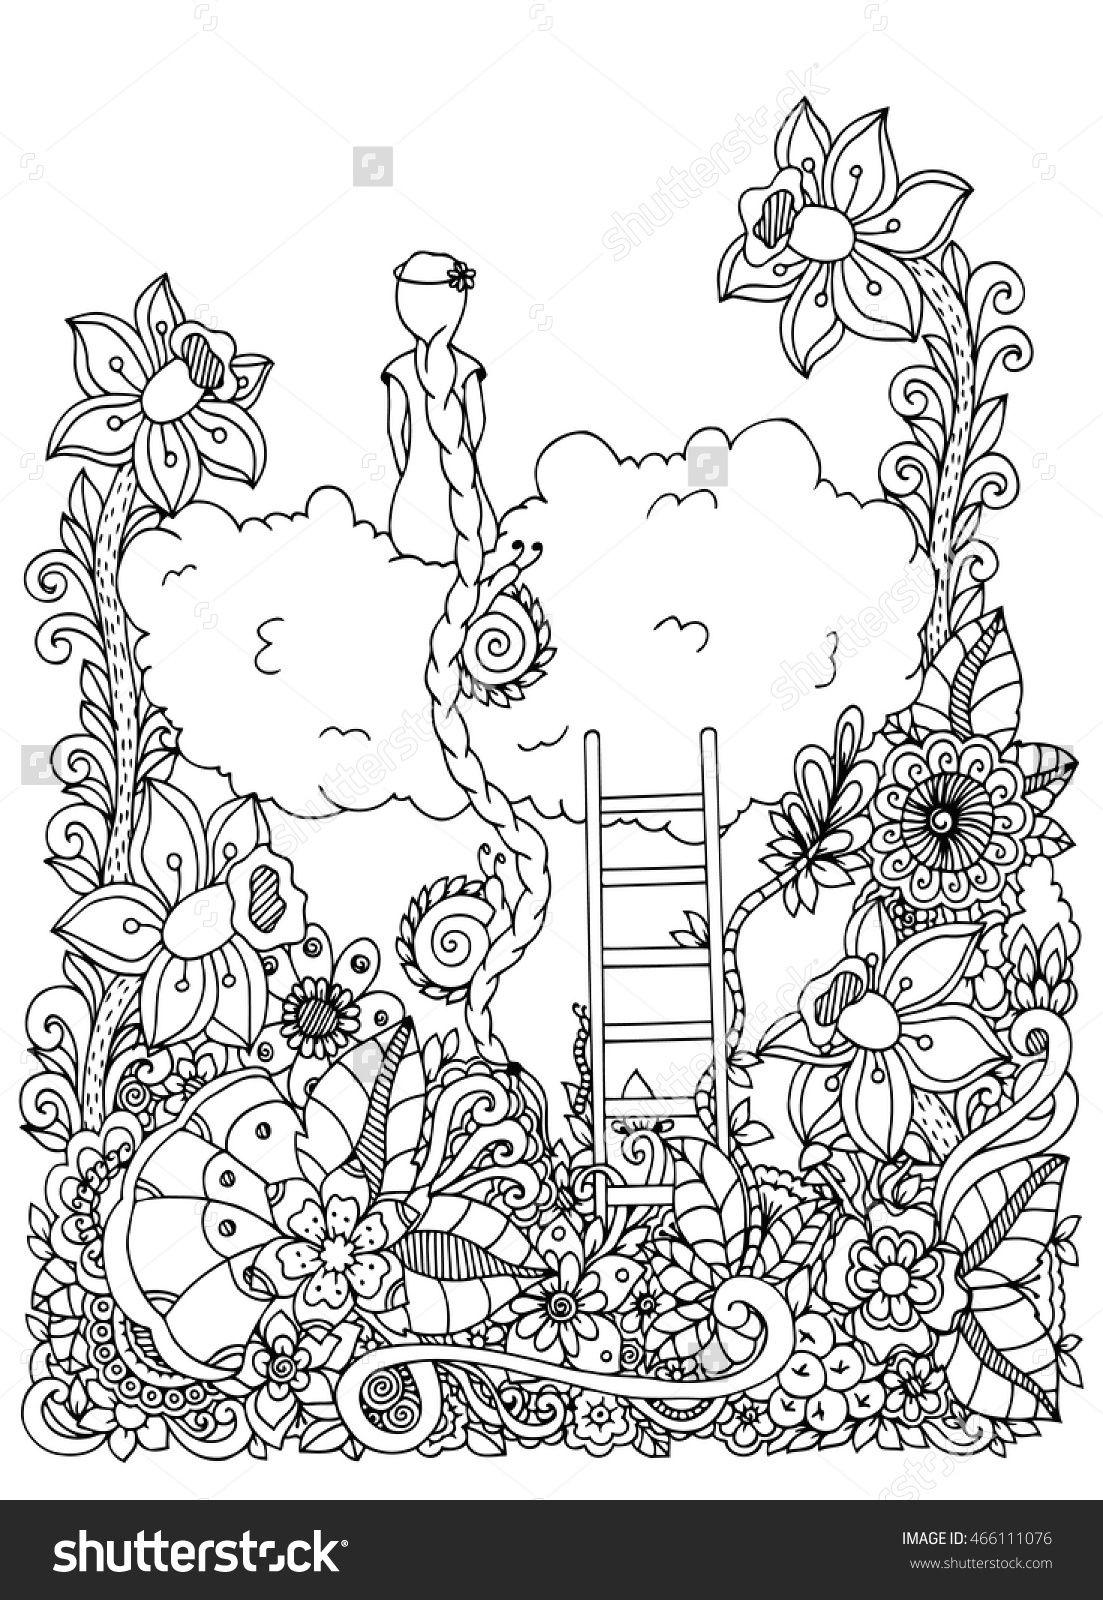 Pin de Patricia Iannone en Zentangles - Mujeres | Pinterest ...